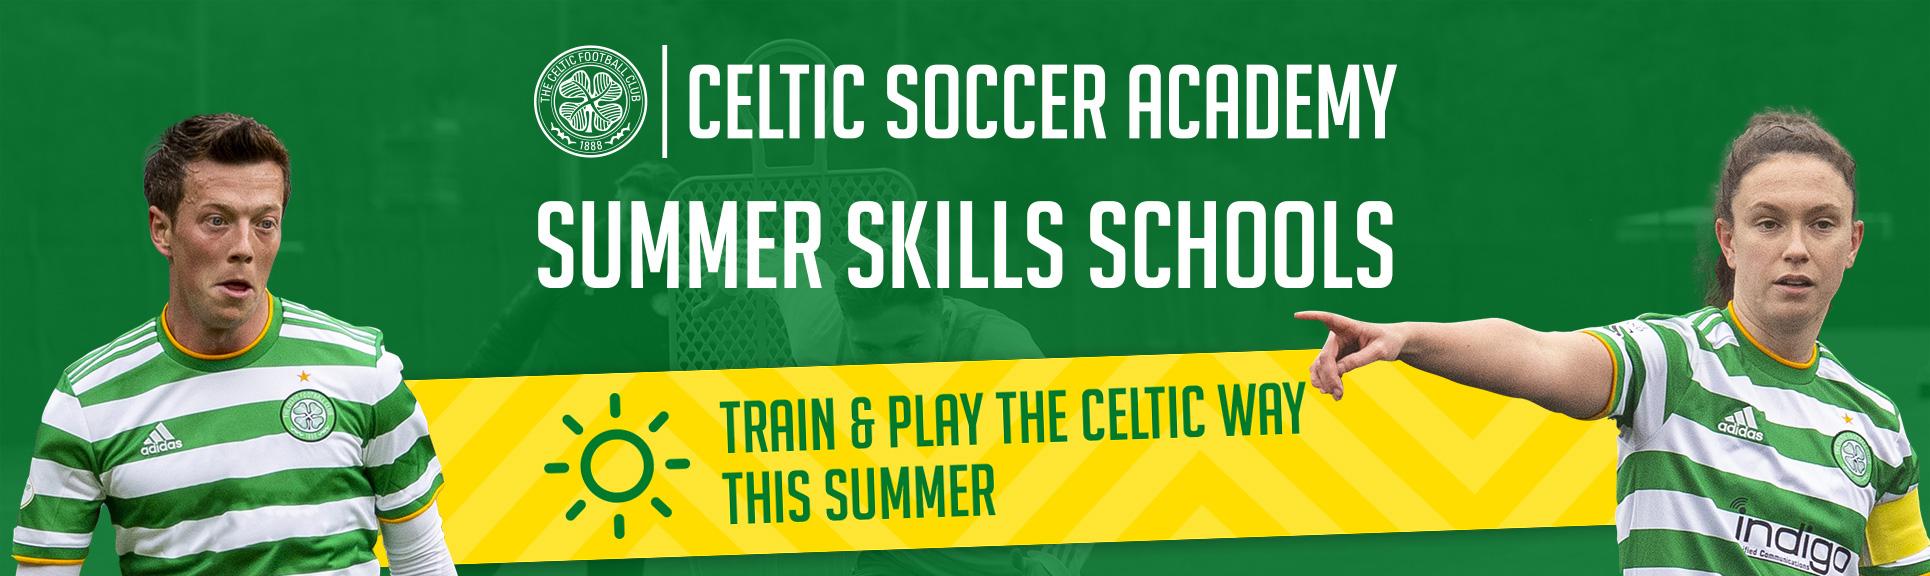 Summer-Skills-Schools-1930x576_web